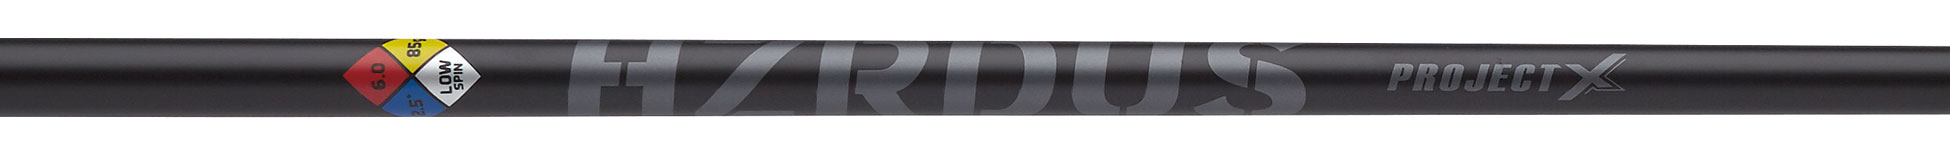 taylormade P790 UDI HZRDUS 85 Shaft.jpg